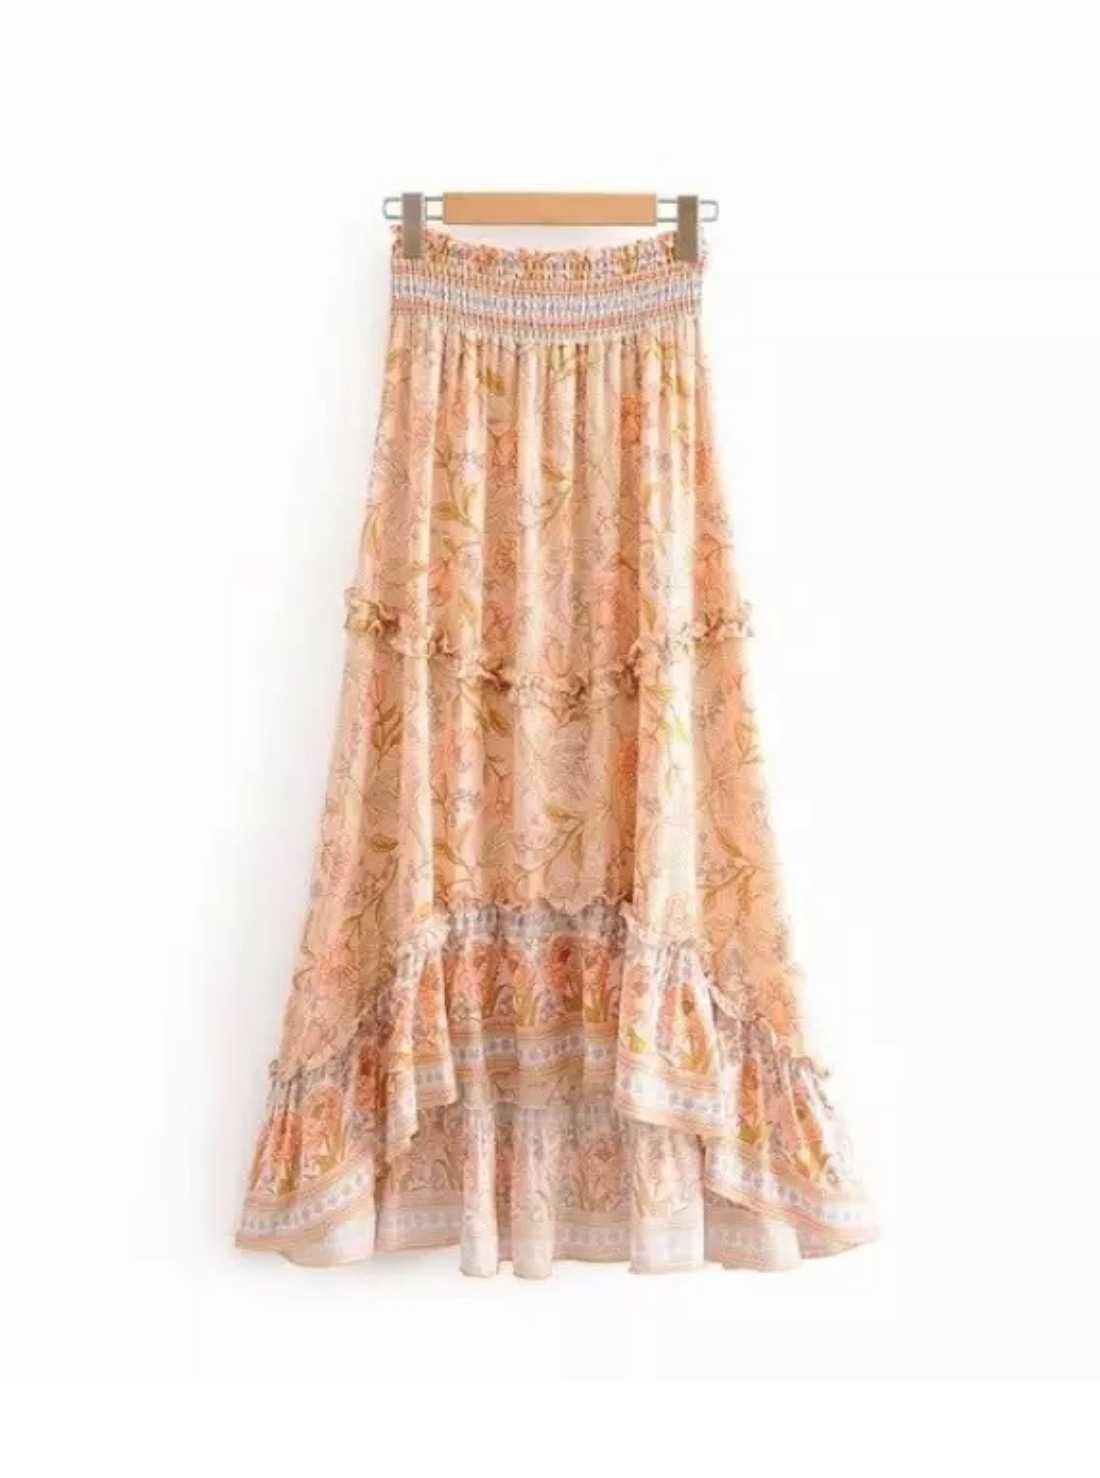 Vintage chic summer bohemian skirt